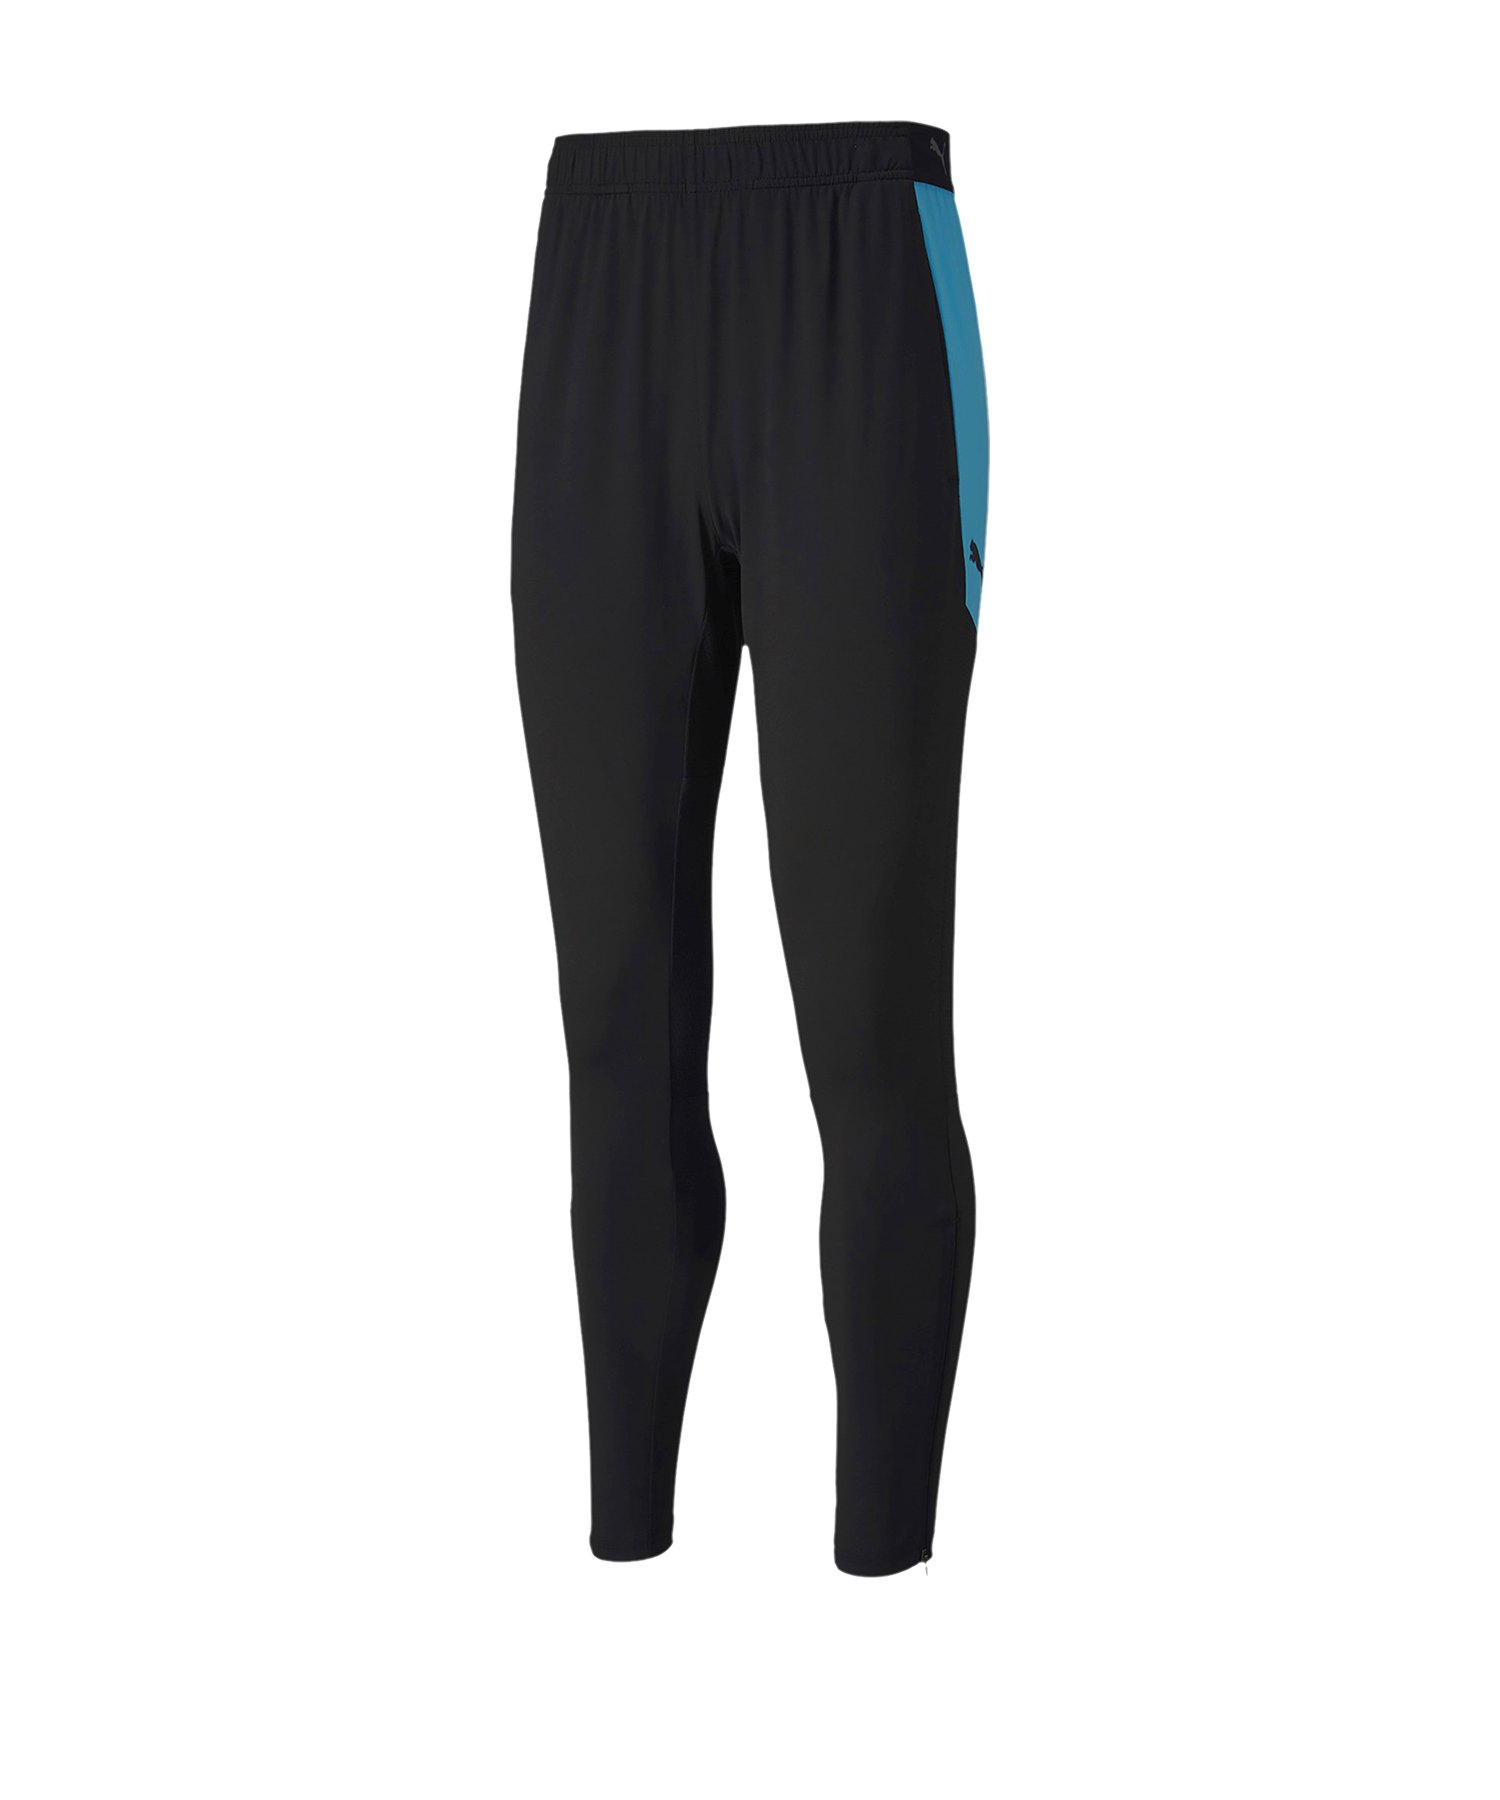 PUMA ftblNXT Pant Trainingshose Schwarz Blau F01 - schwarz